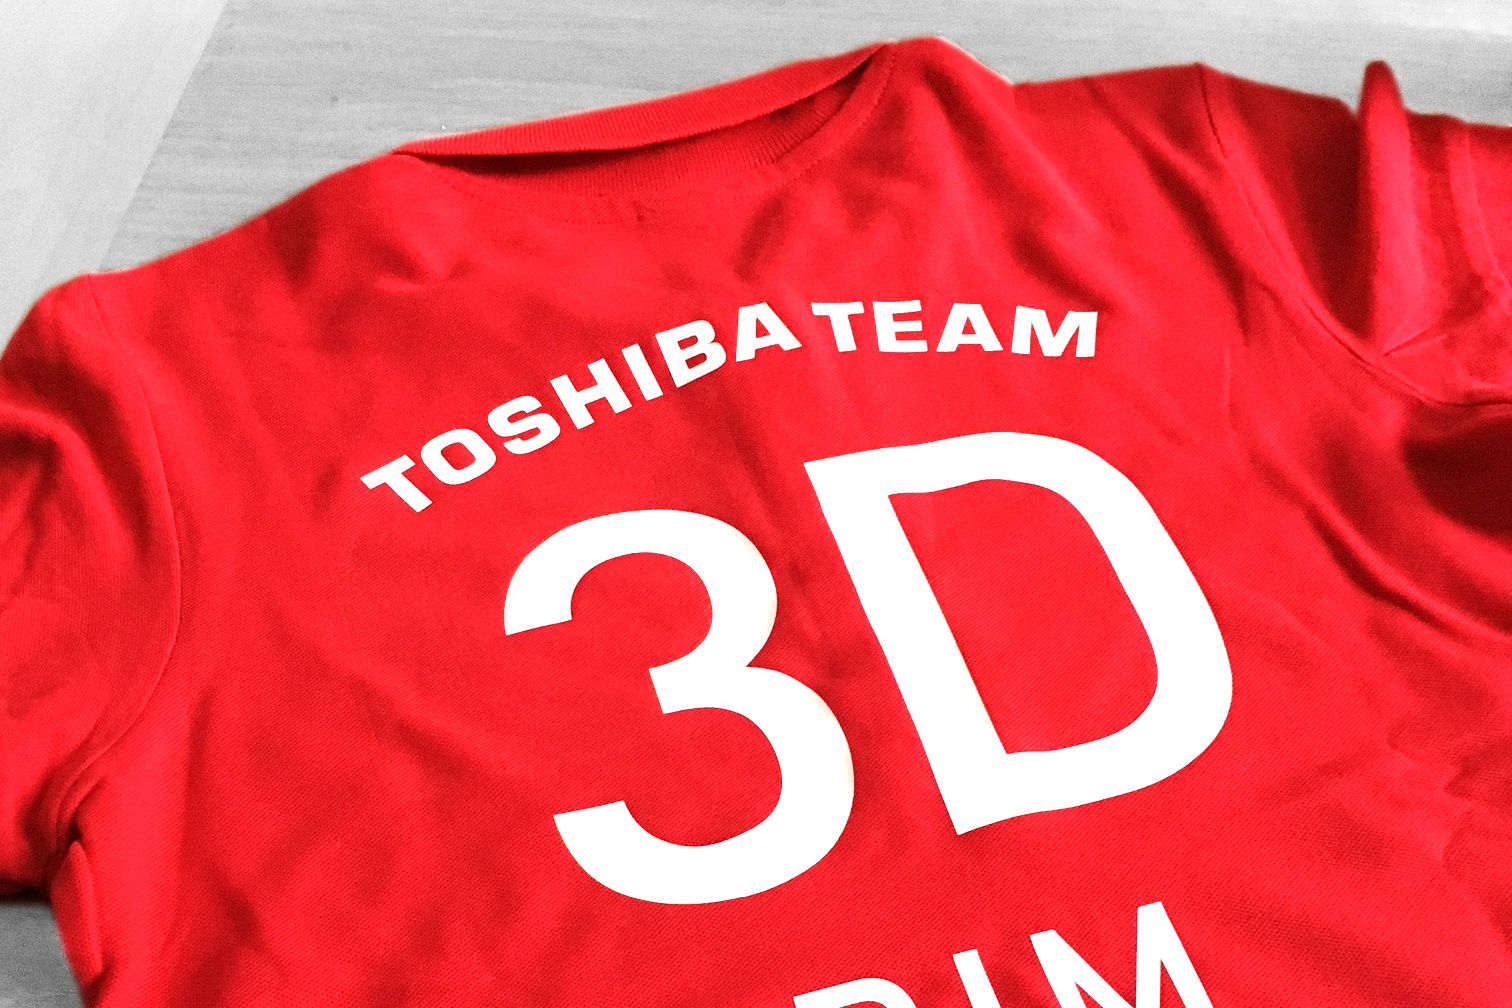 Toshiba Klimasysteme Teambekleidung T-Shirt